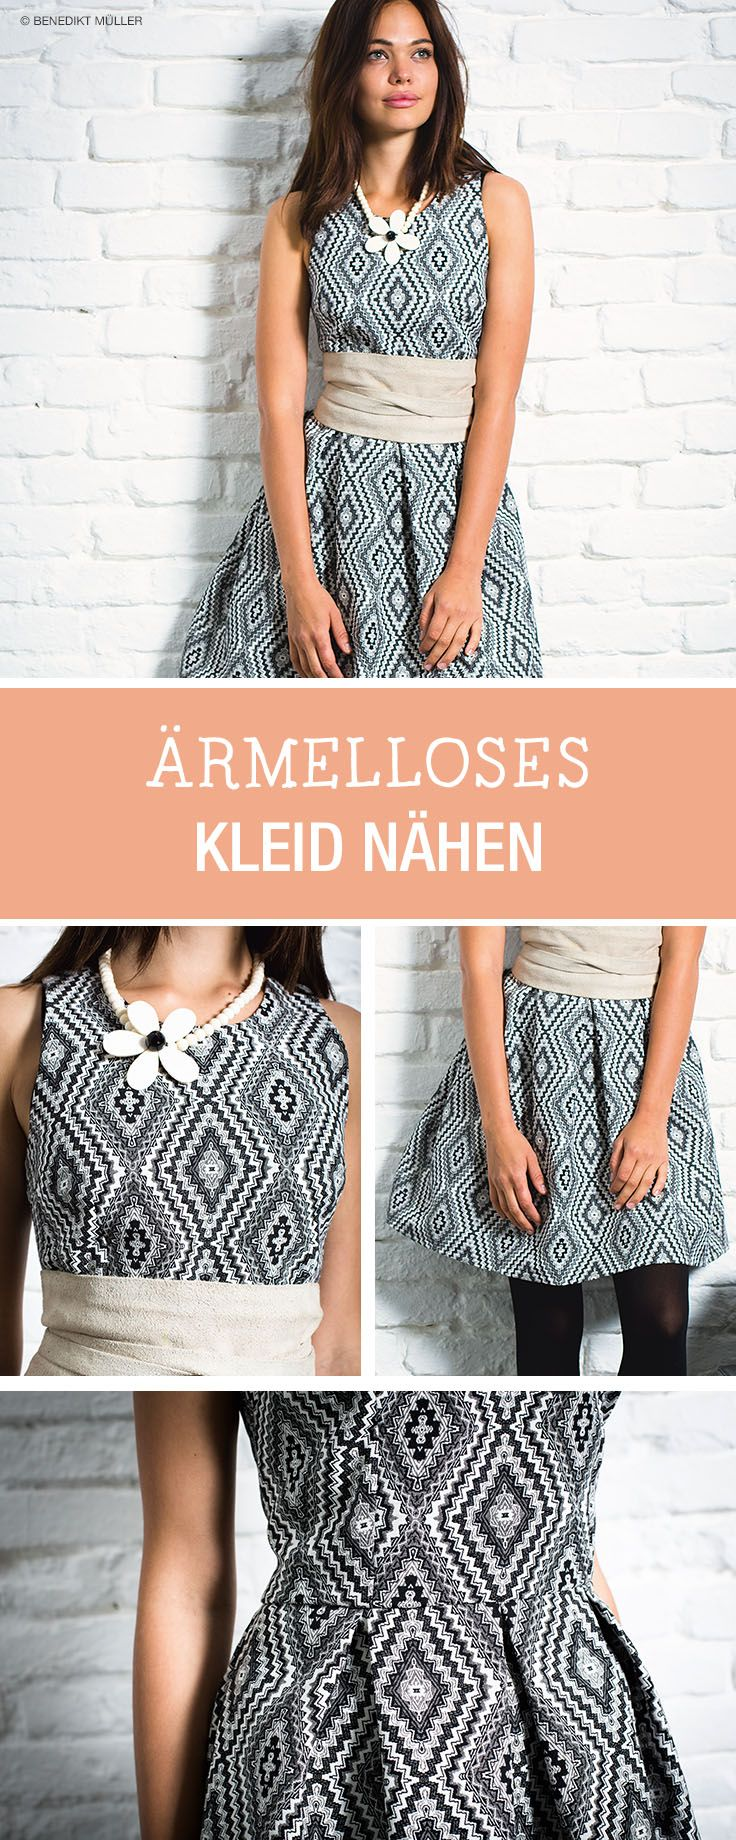 DIY-Anleitung: Ärmelloses Kleid aus Jacquard nähen via DaWanda.com ...